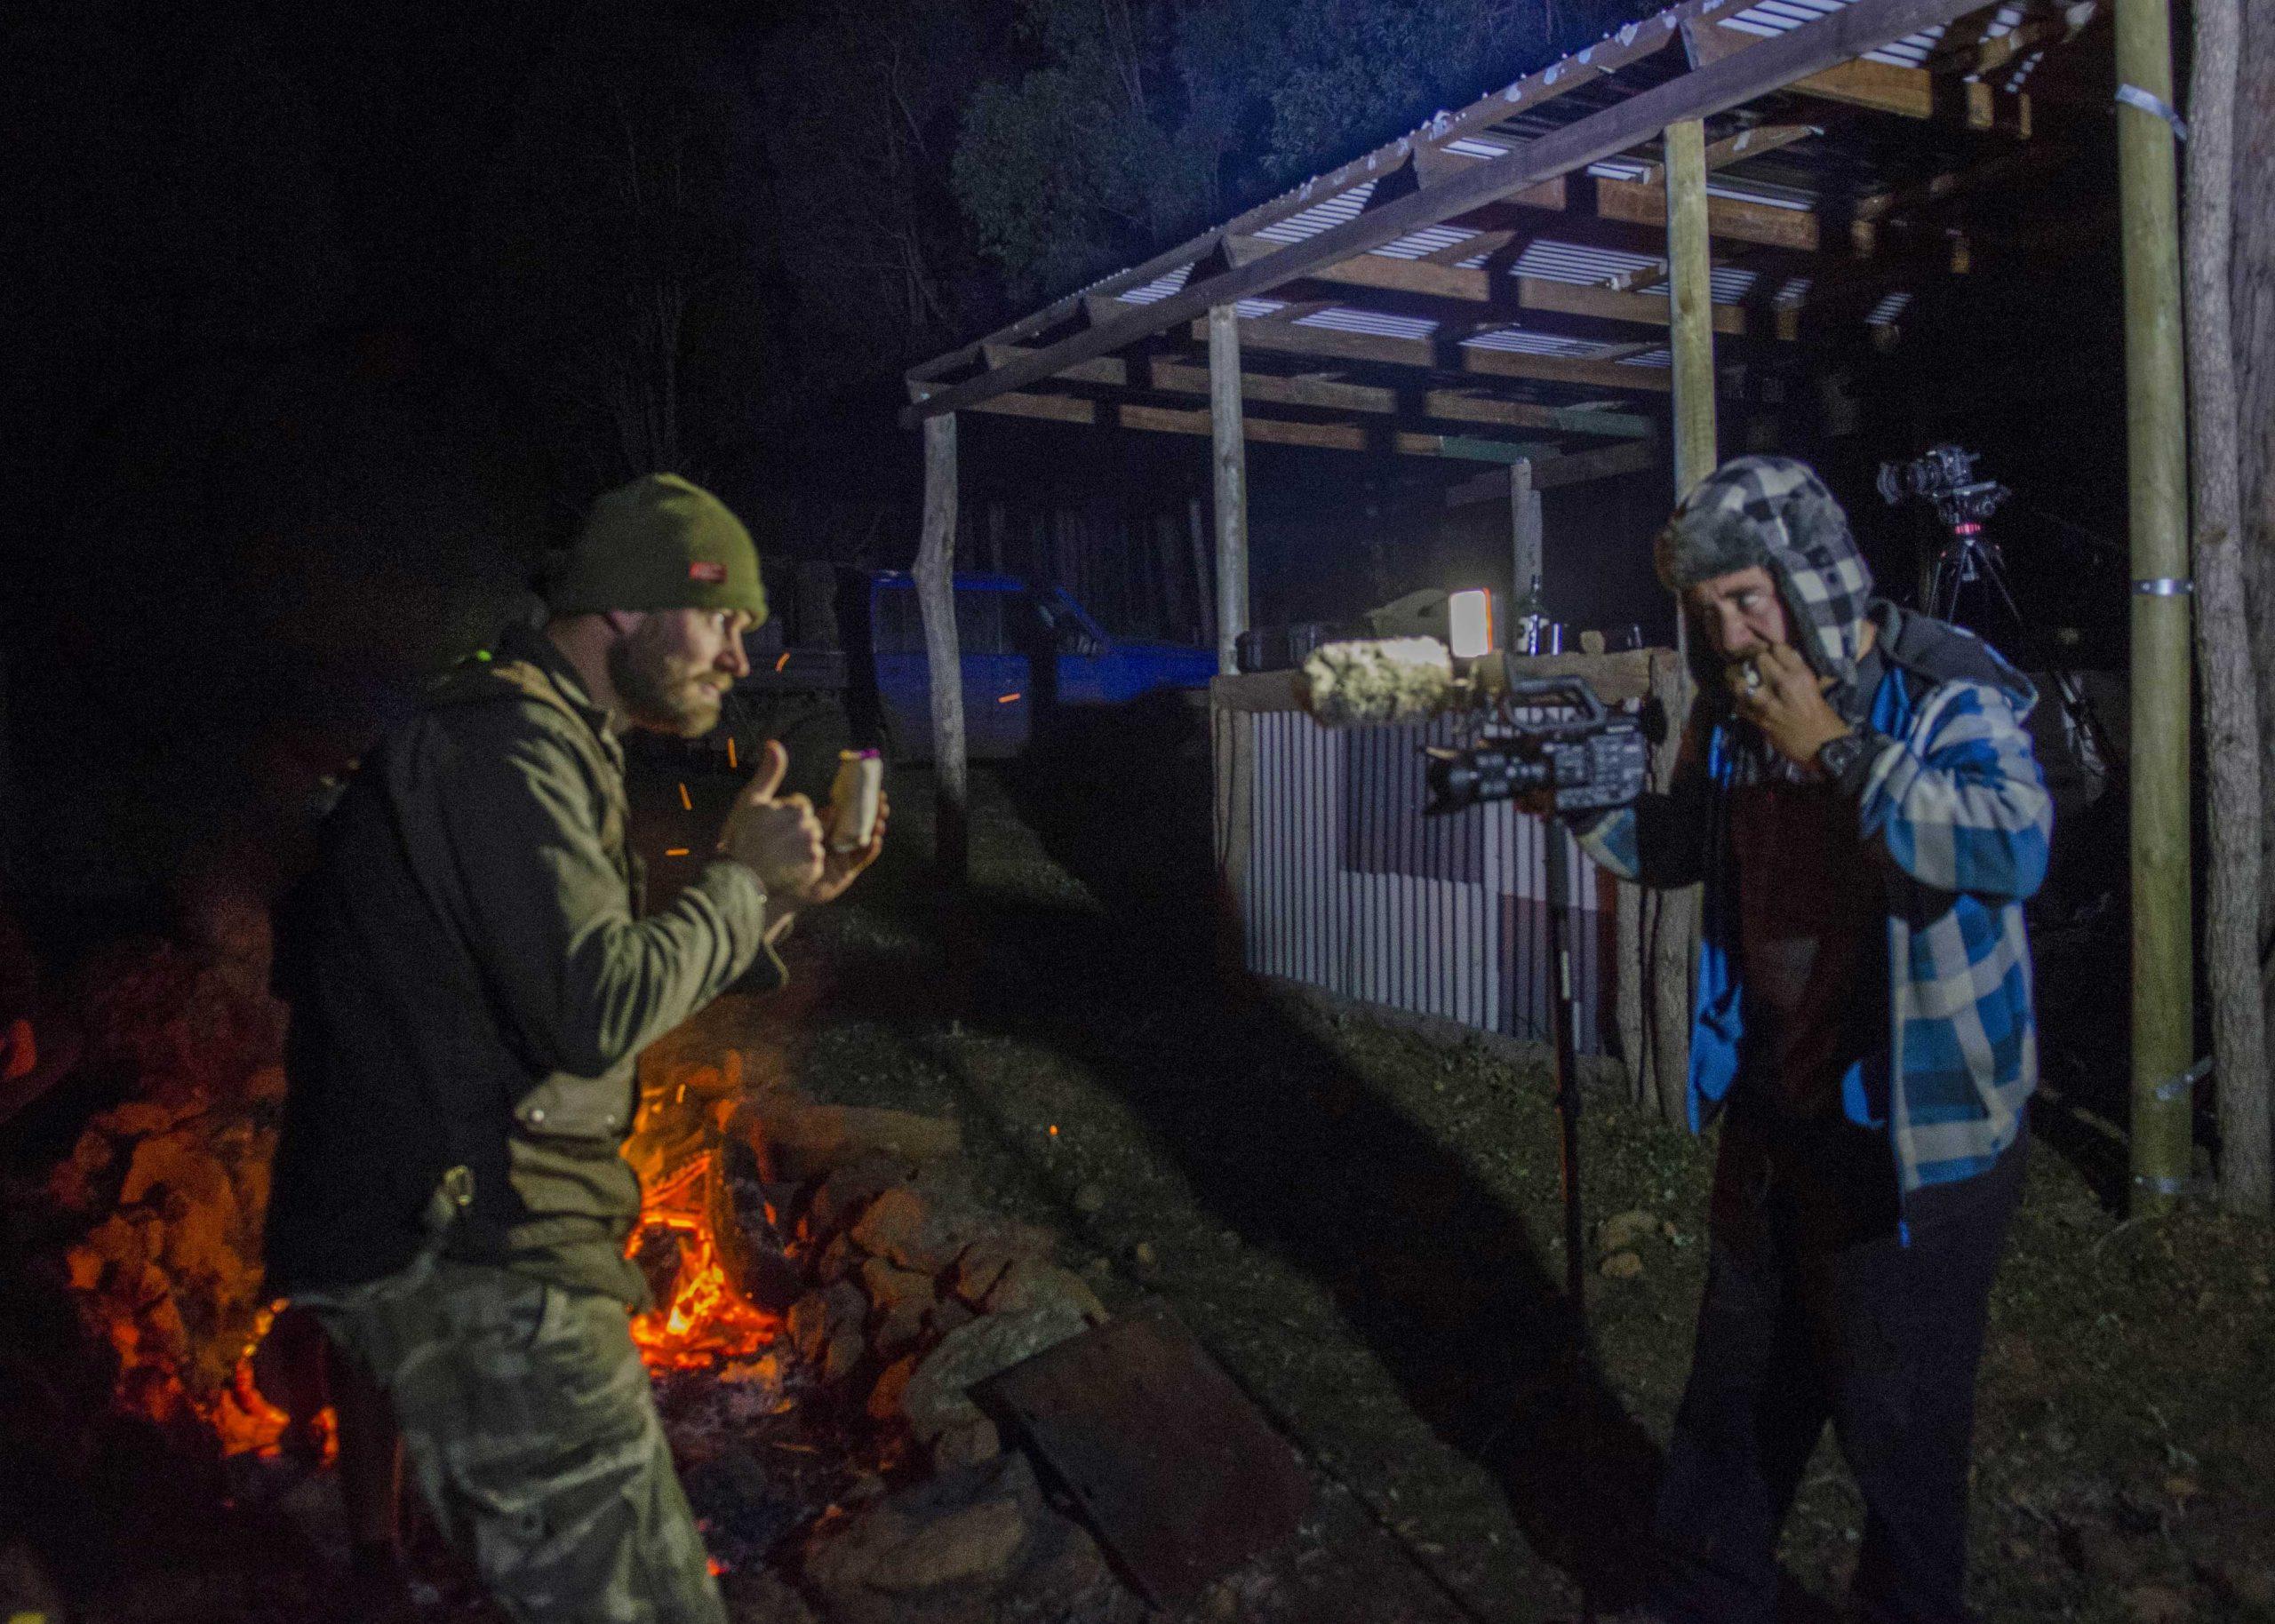 Ronny Dahl enjoying the pulled pork